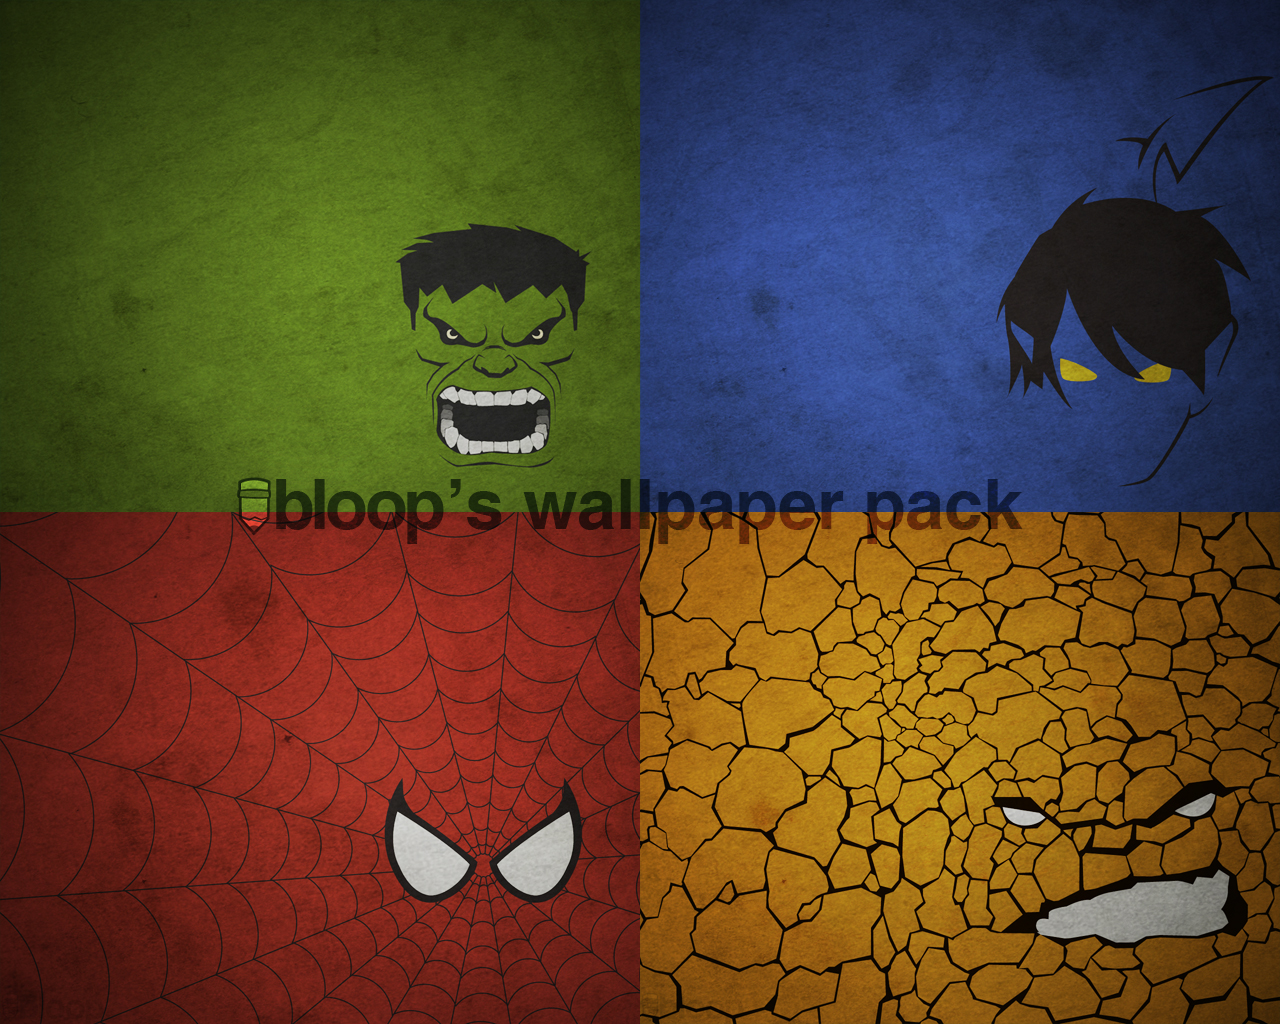 Free wallpaper superheroes wallpapersafari bloops superhero wallpaper by blo0p customization wallpaper voltagebd Image collections